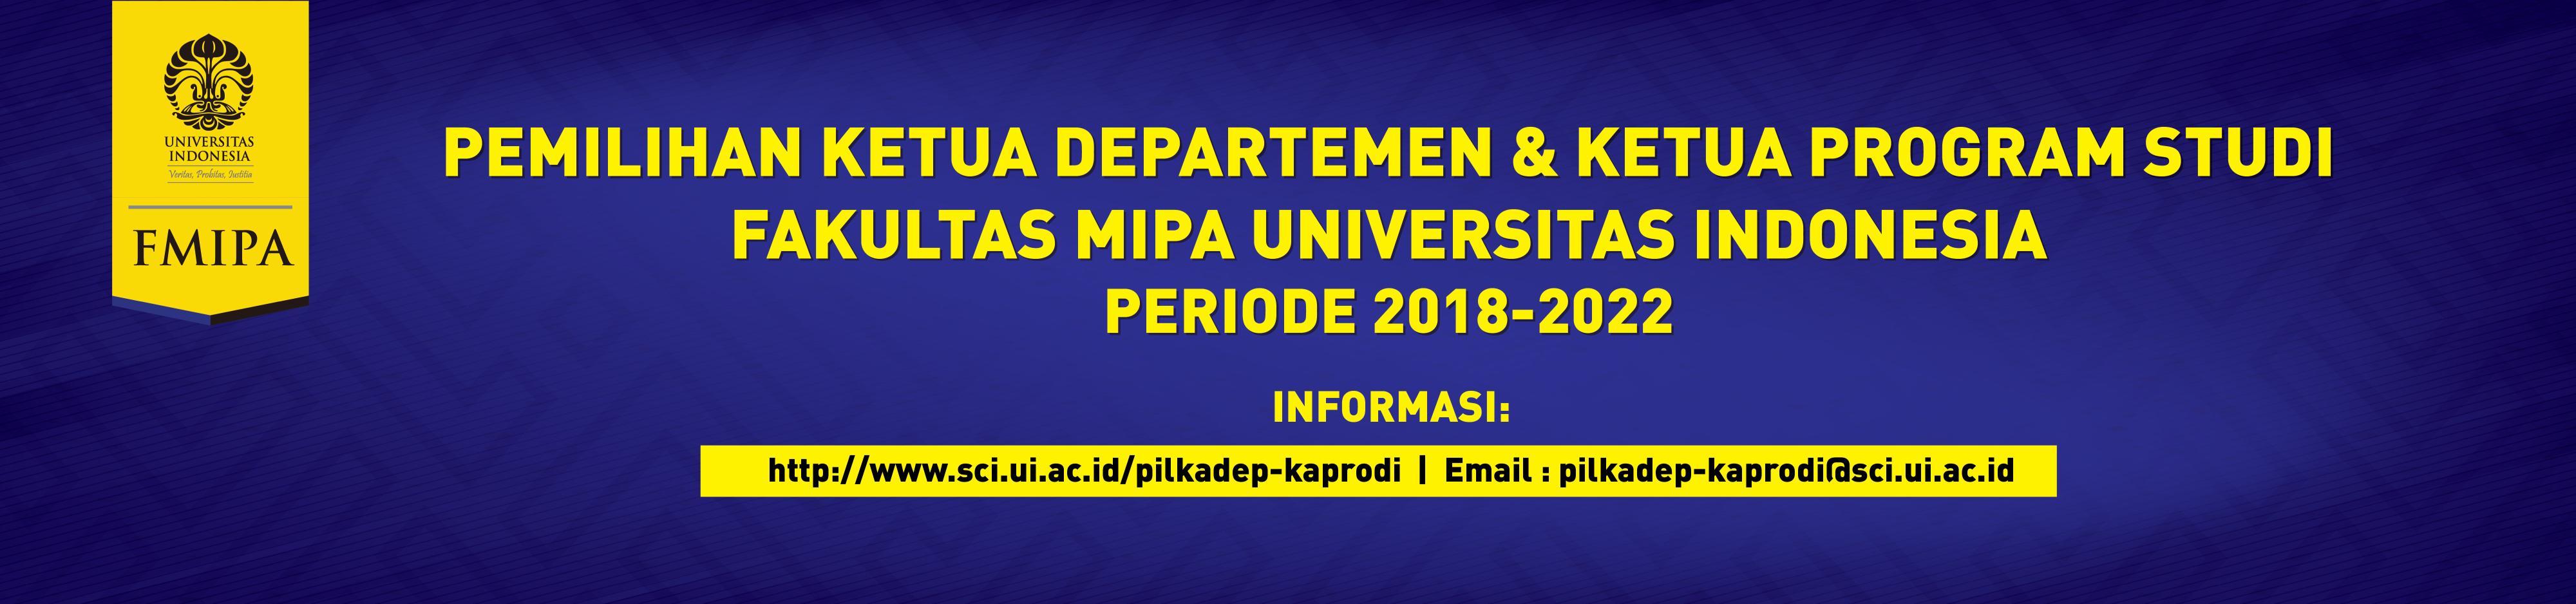 Web-Banner-Pilkadep_Rev2